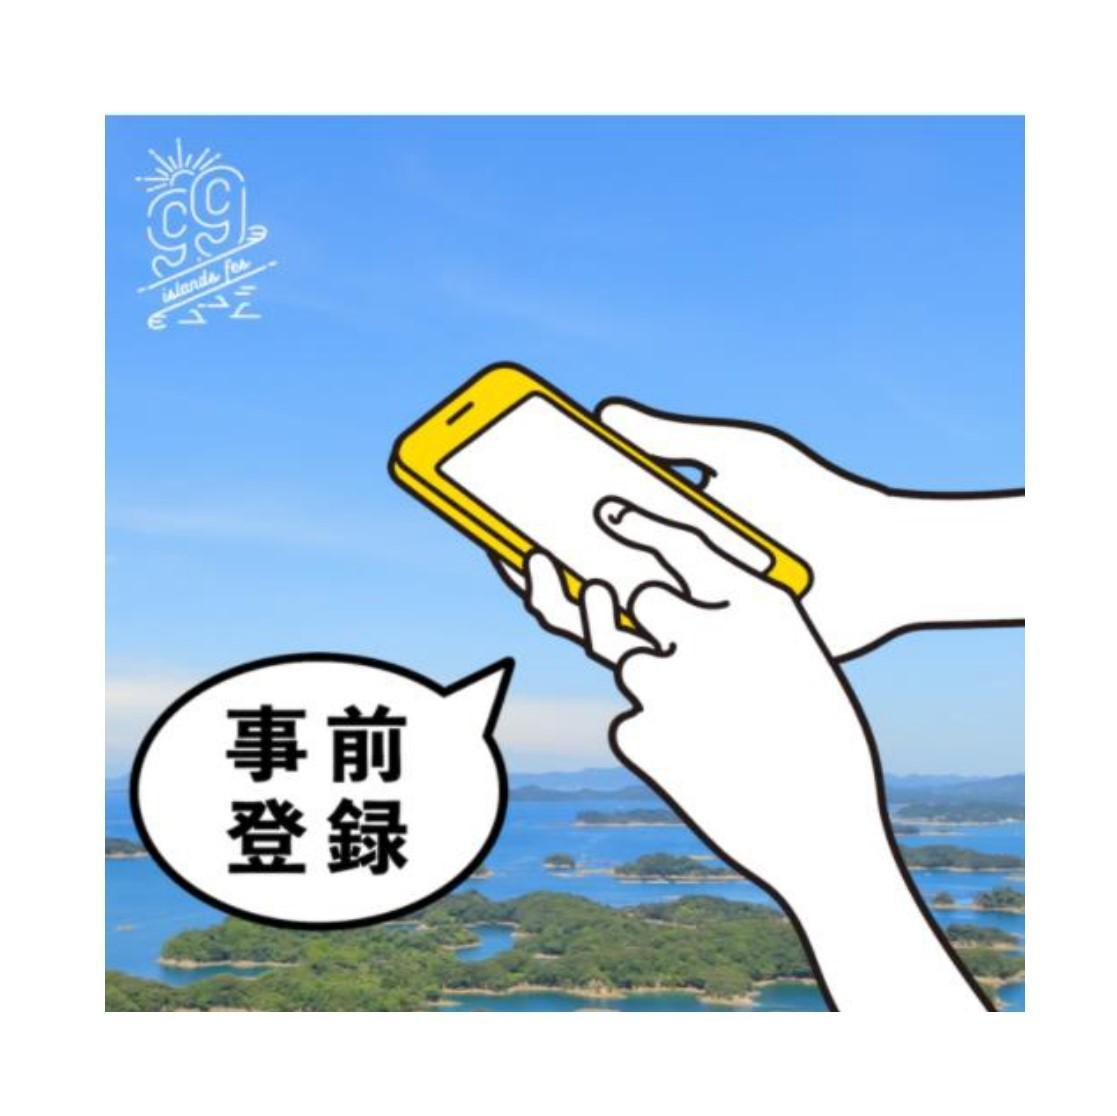 【中止】99ISLANDSFESTIVAL-1